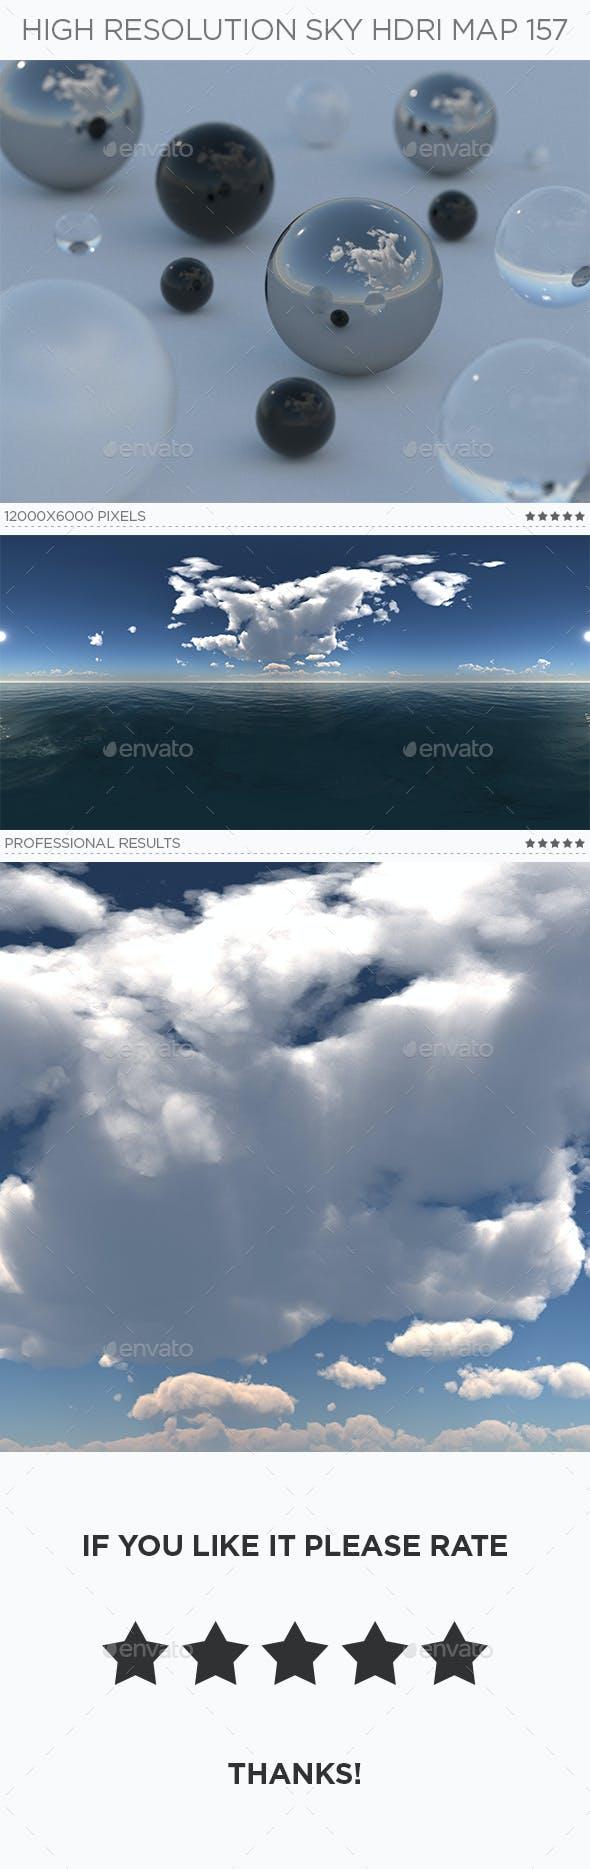 High Resolution Sky HDRi Map 157 - 3DOcean Item for Sale